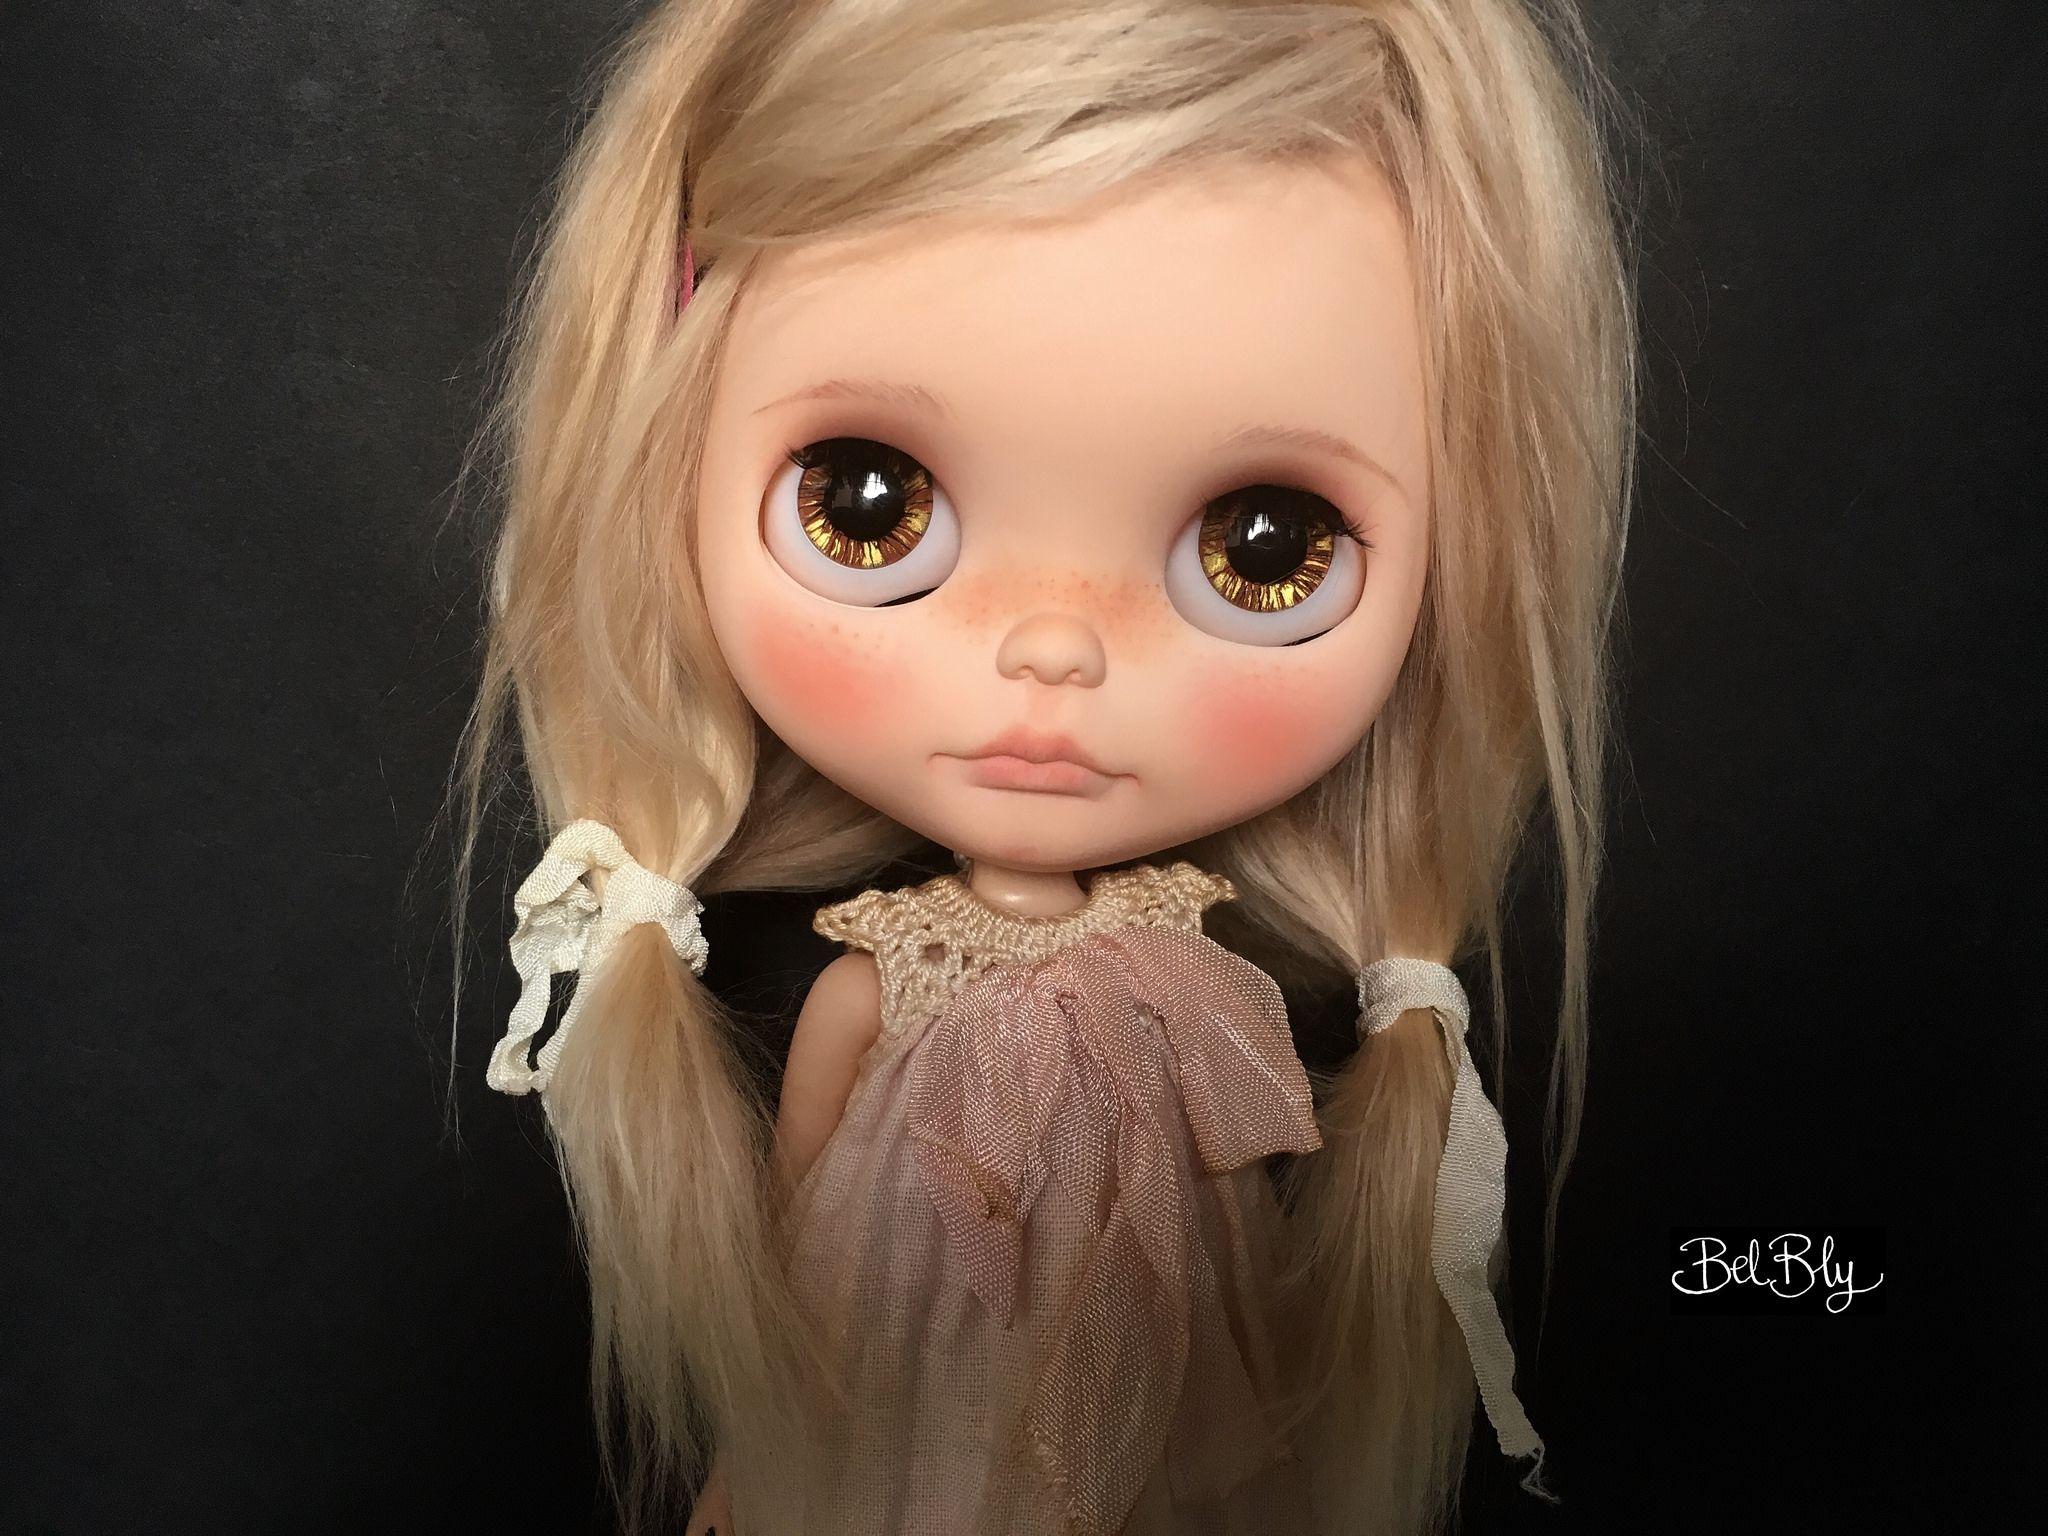 https://flic.kr/p/C77dma | Elaiza | My first blythe custom of the year